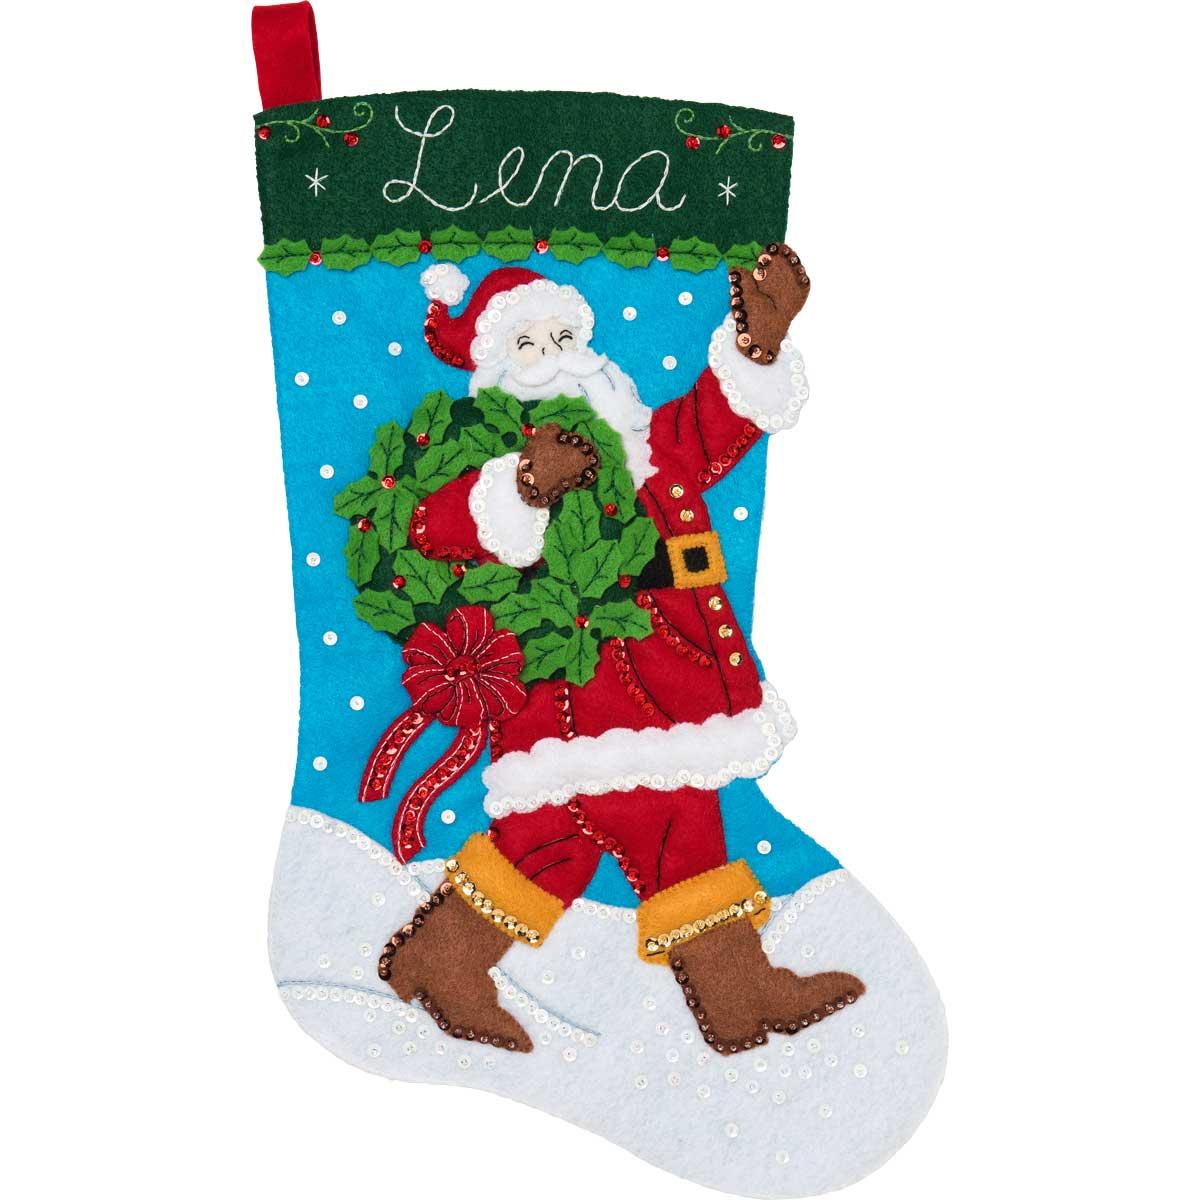 Bucilla ® Seasonal - Felt - Stocking Kits - Hallmark - Greetings From Santa